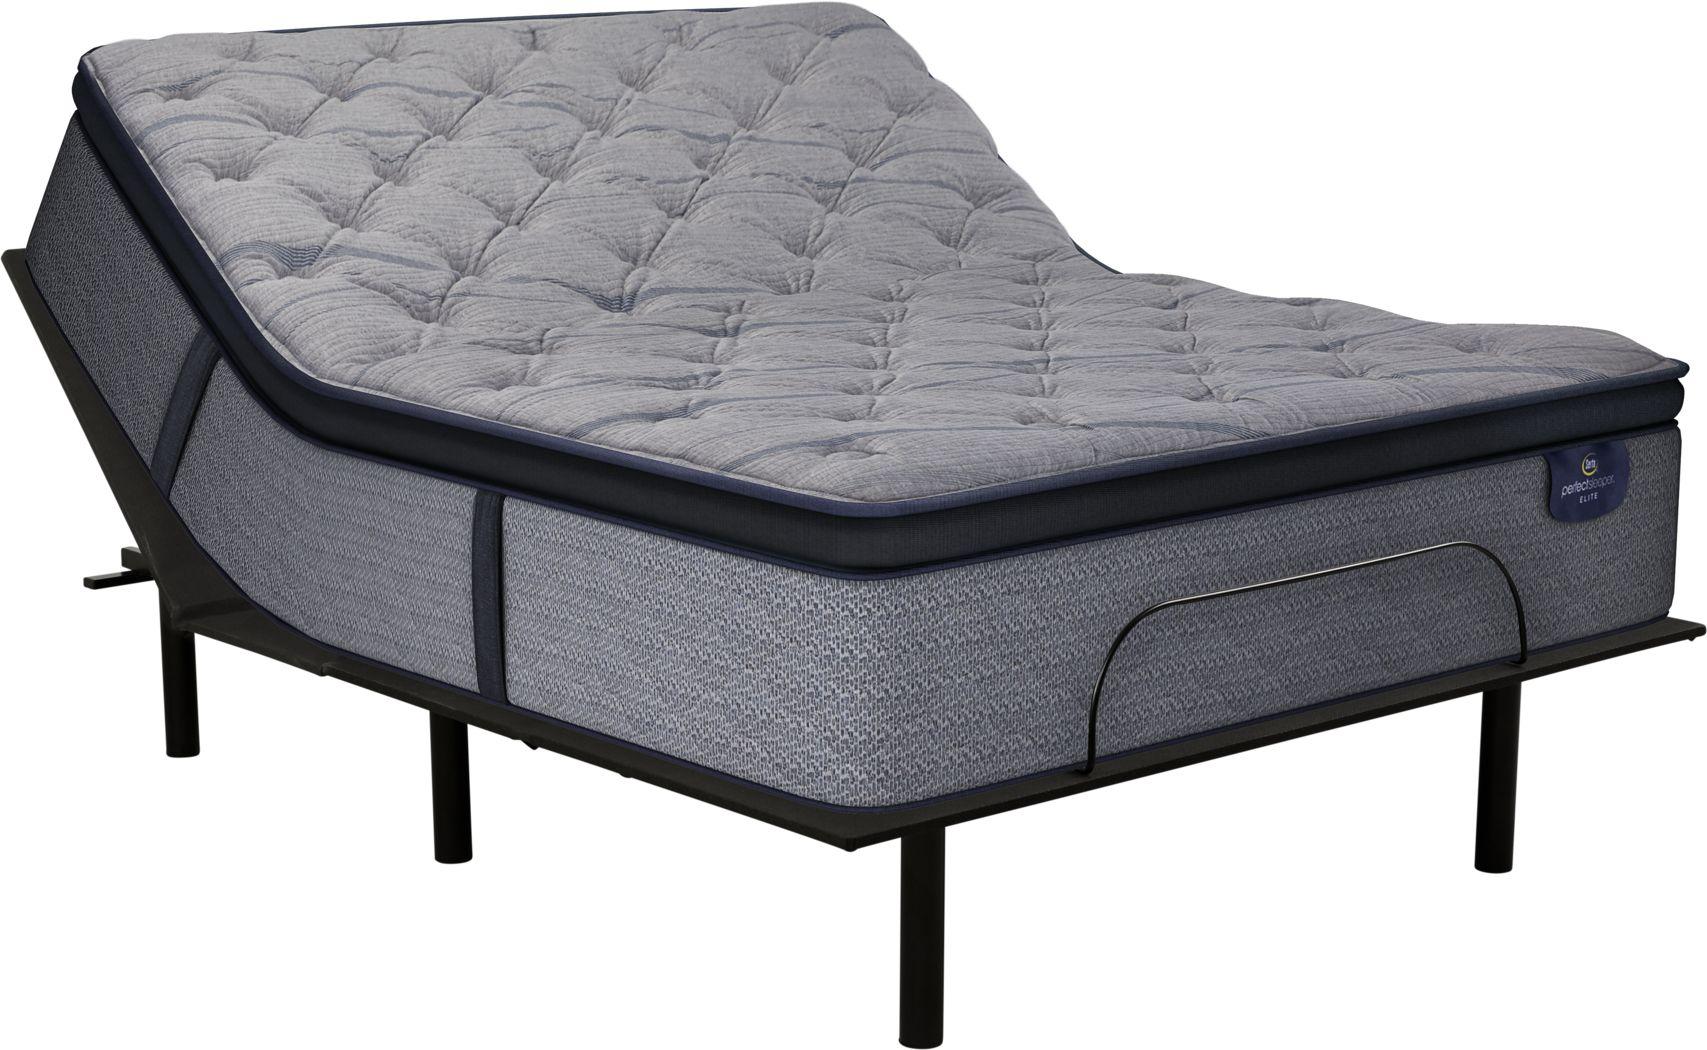 Serta Perfect Sleeper Vernon Hills King Mattress with RTG Sleep 2000 Adjustable Base